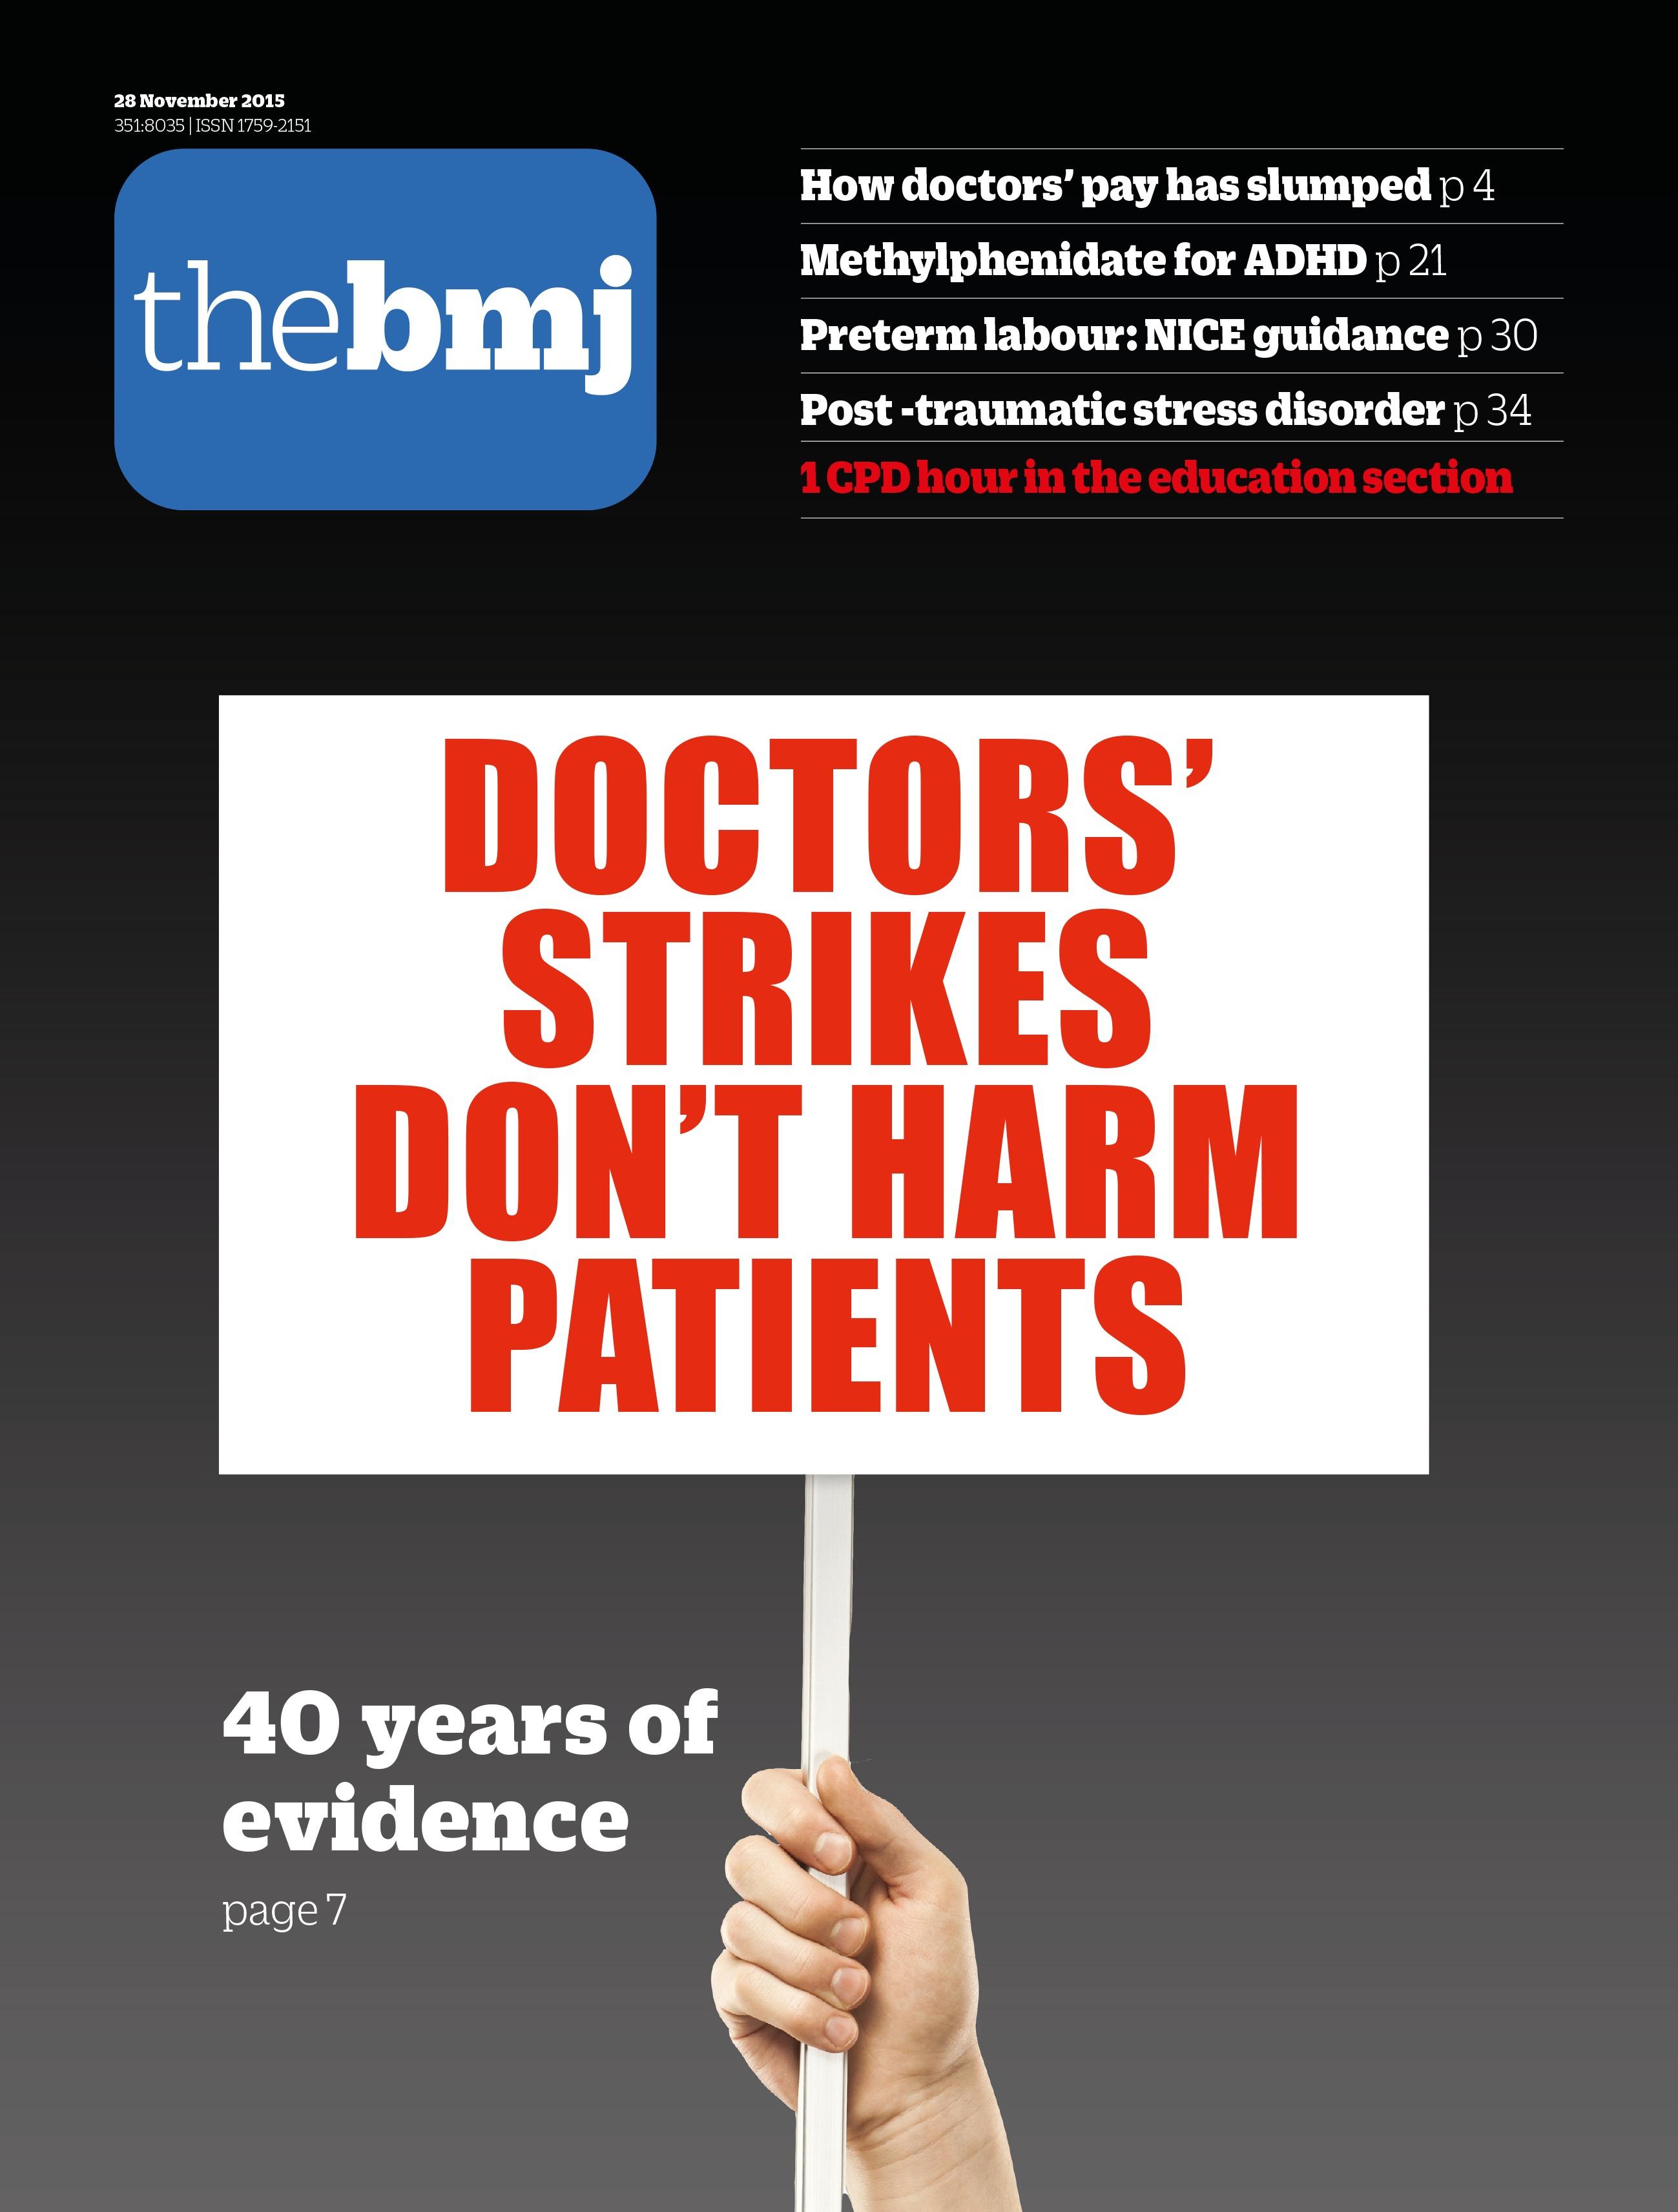 Diagnosing chronic obstructive pulmonary disease | The BMJ